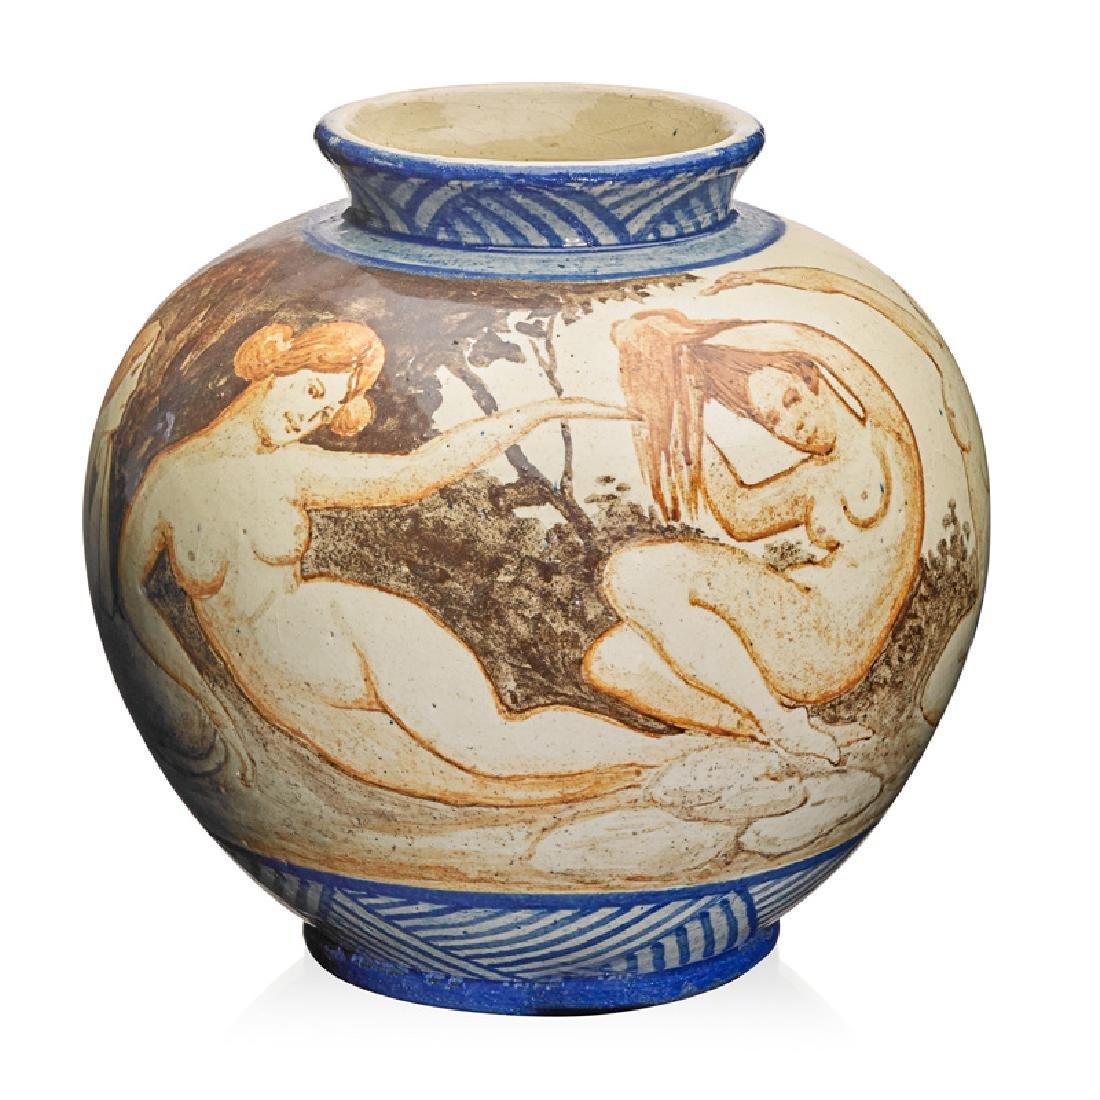 RORSTRAND Vase with nudes